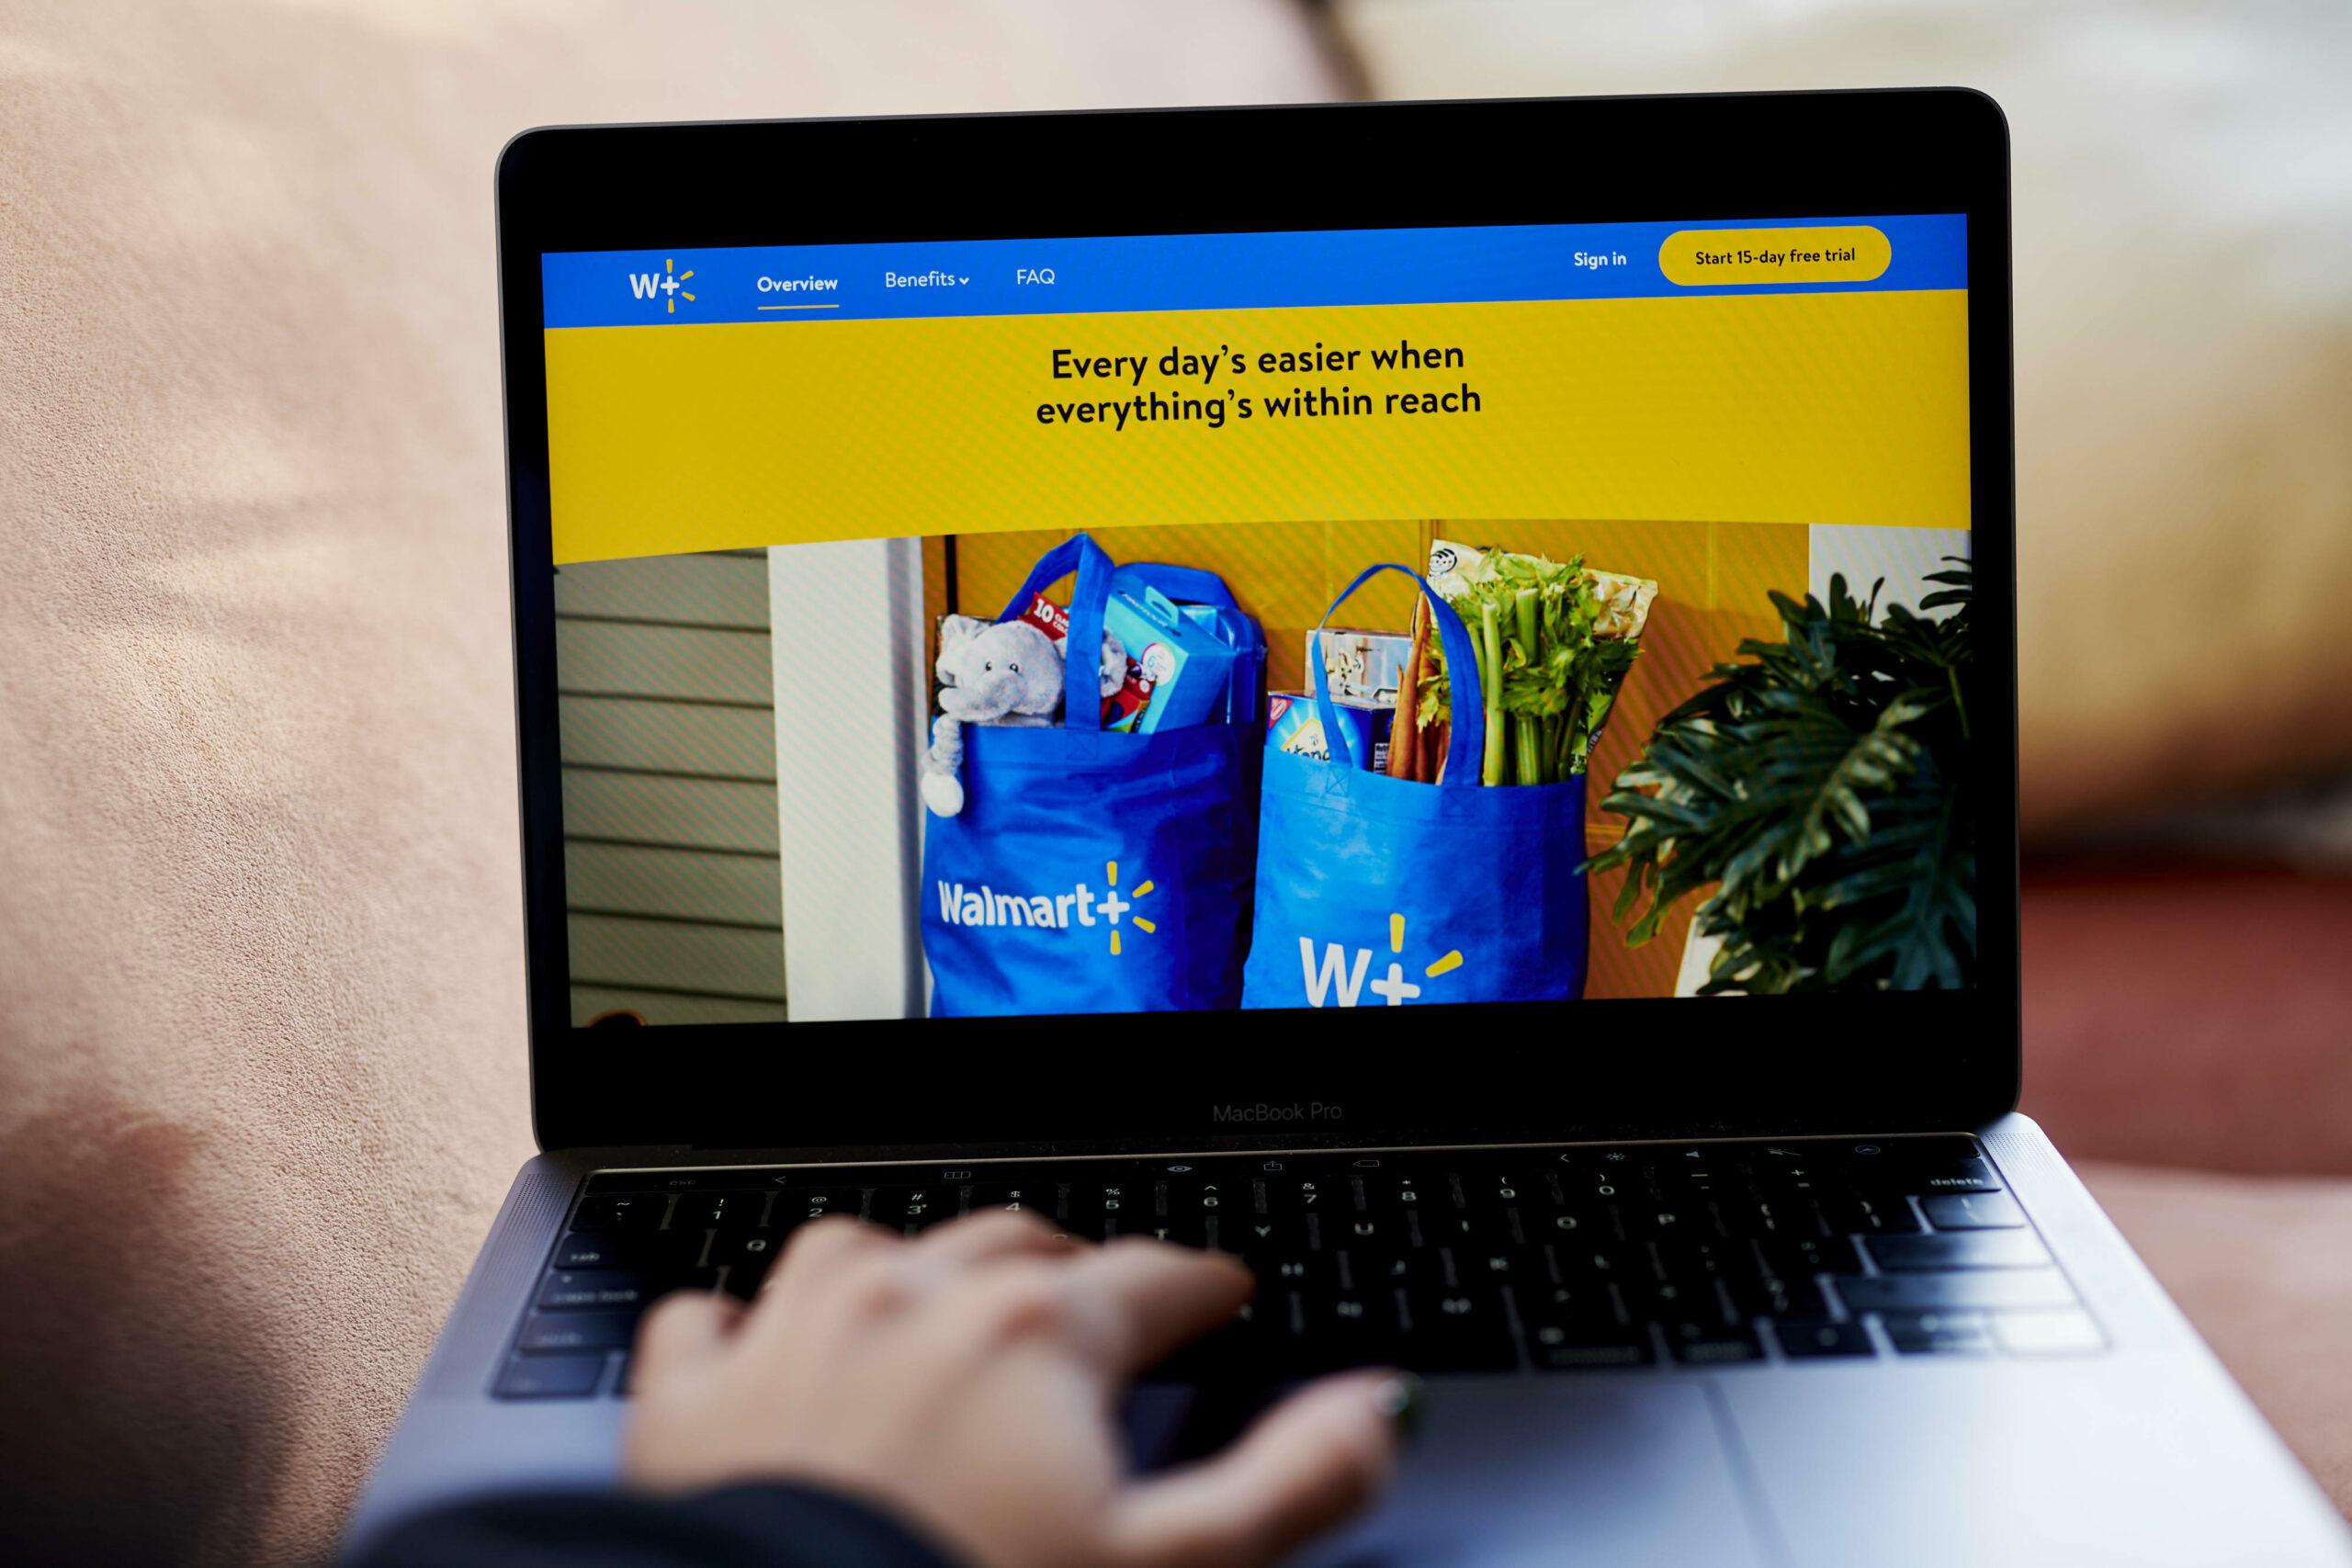 Walmart+ hits 32 million members, Deutsche Bank estimates